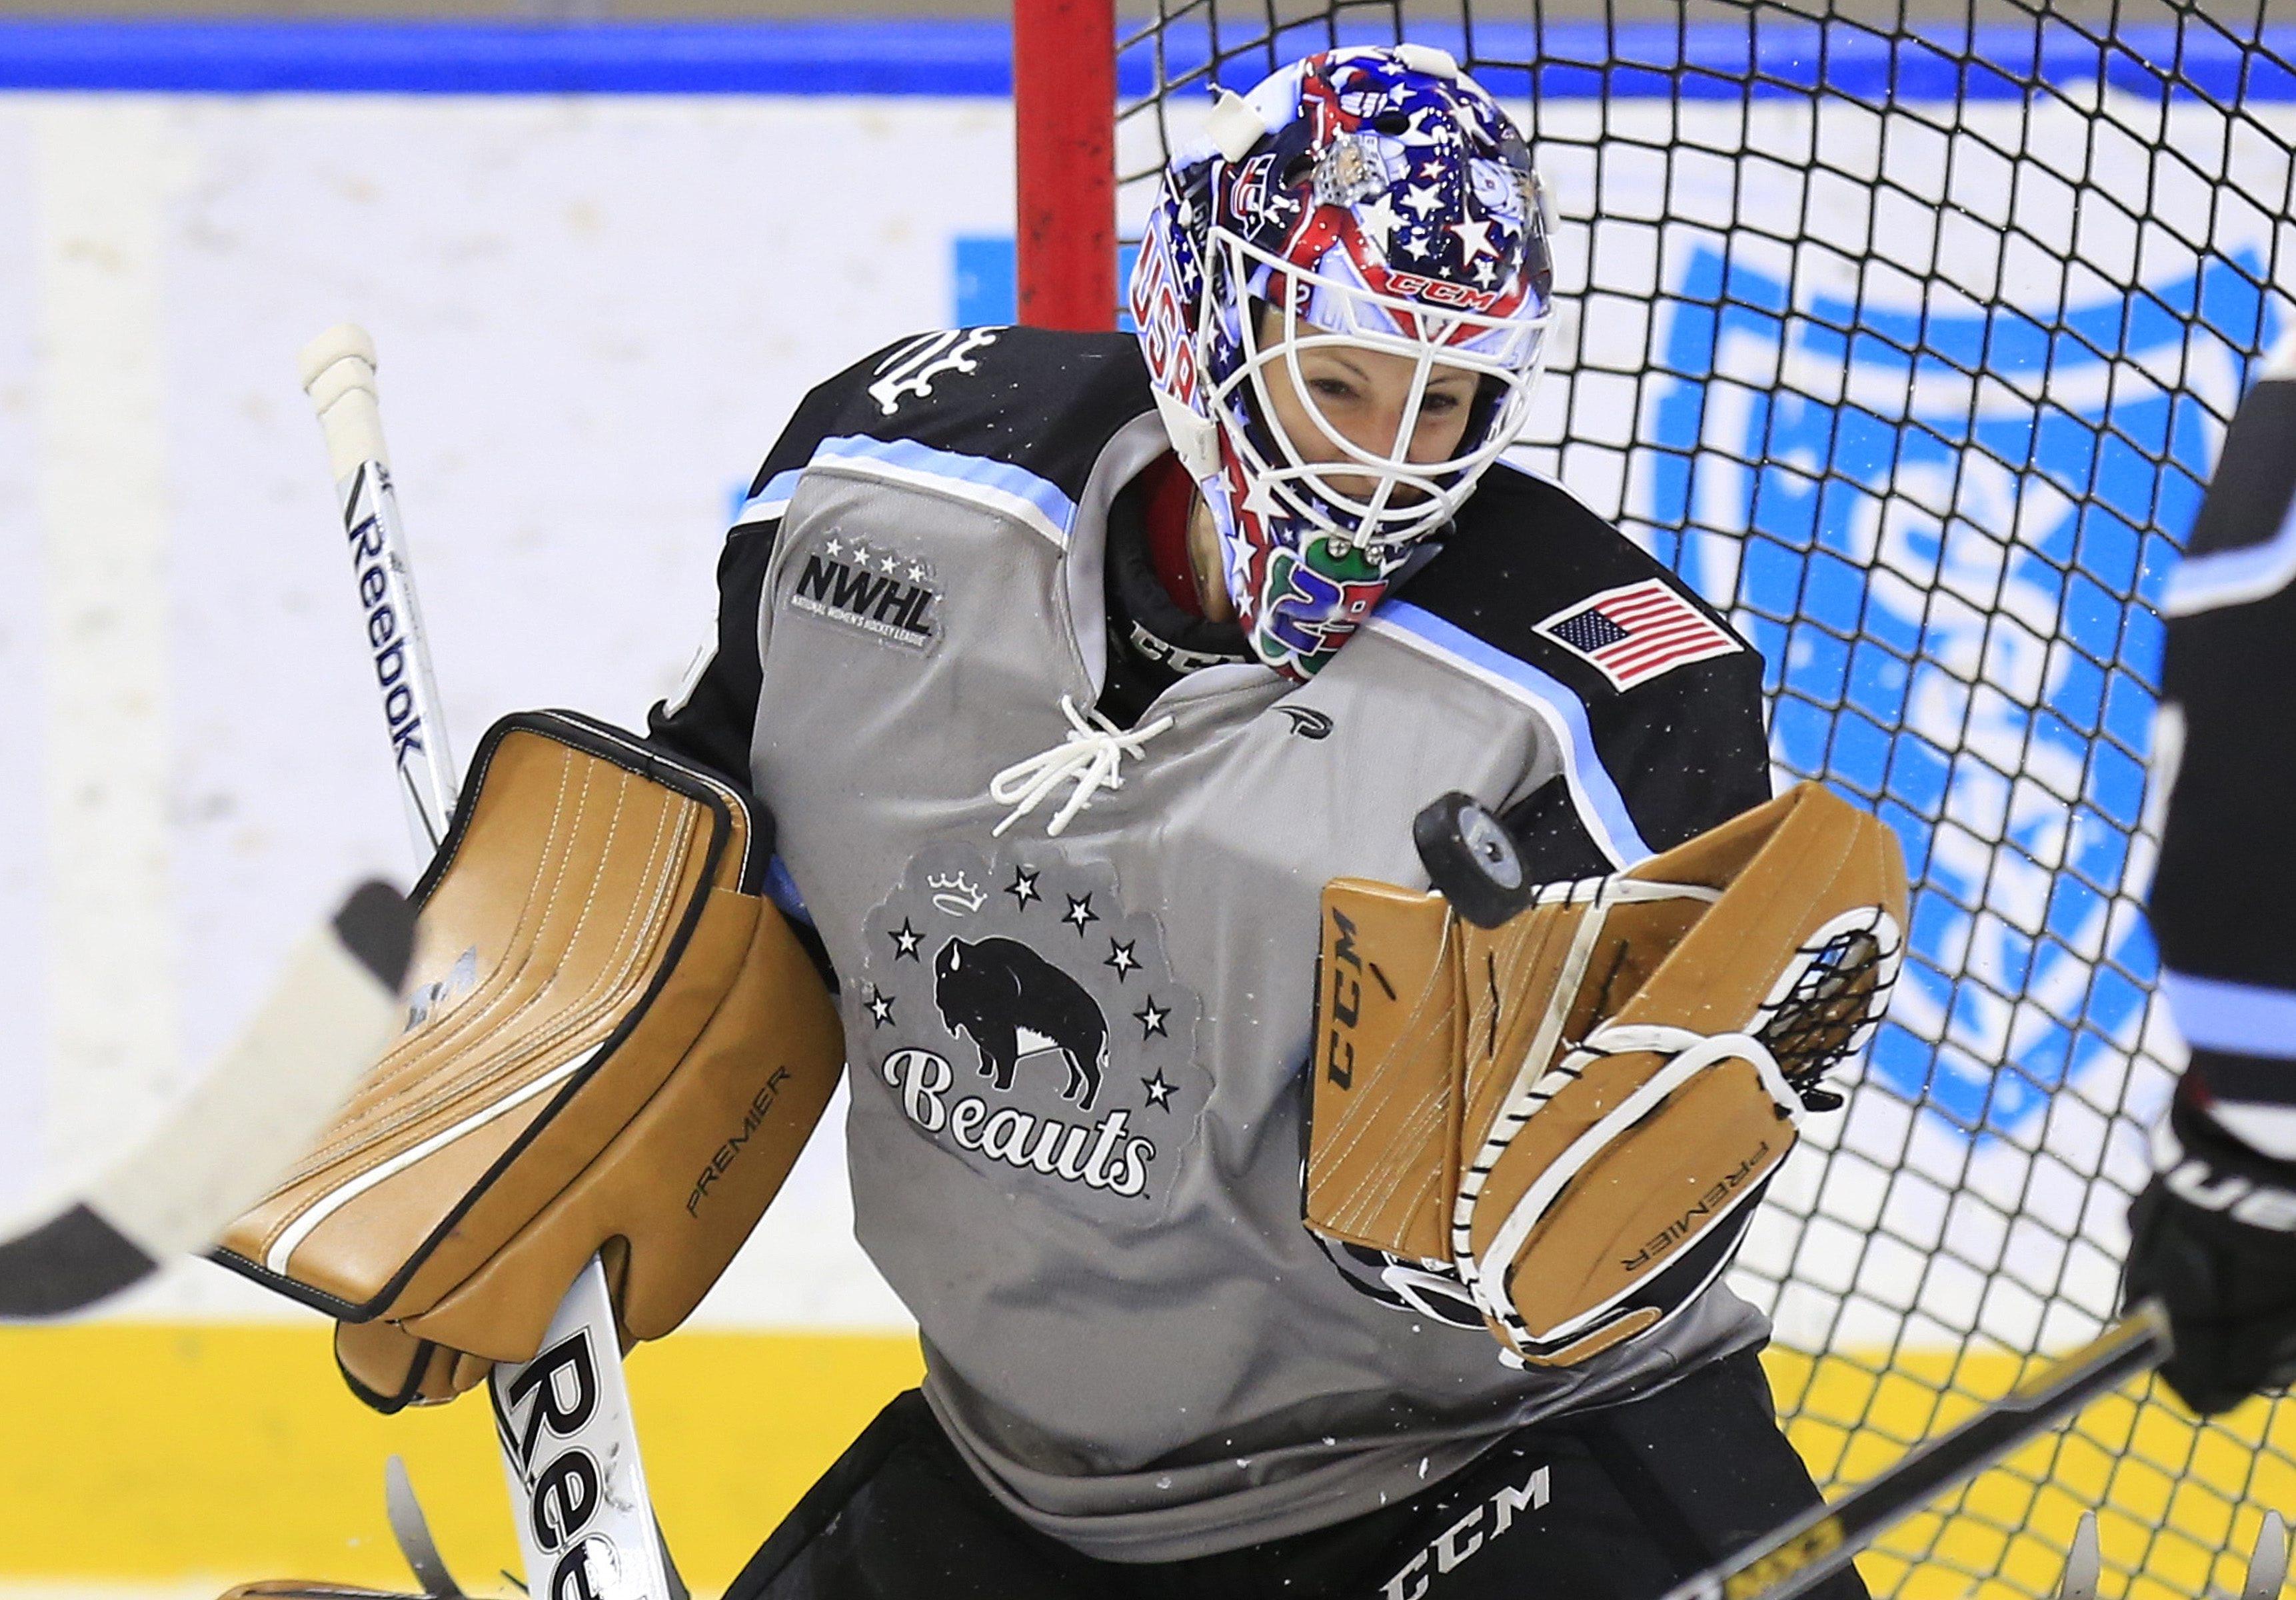 Women S Hockey League Continues To Build Awareness The Buffalo News